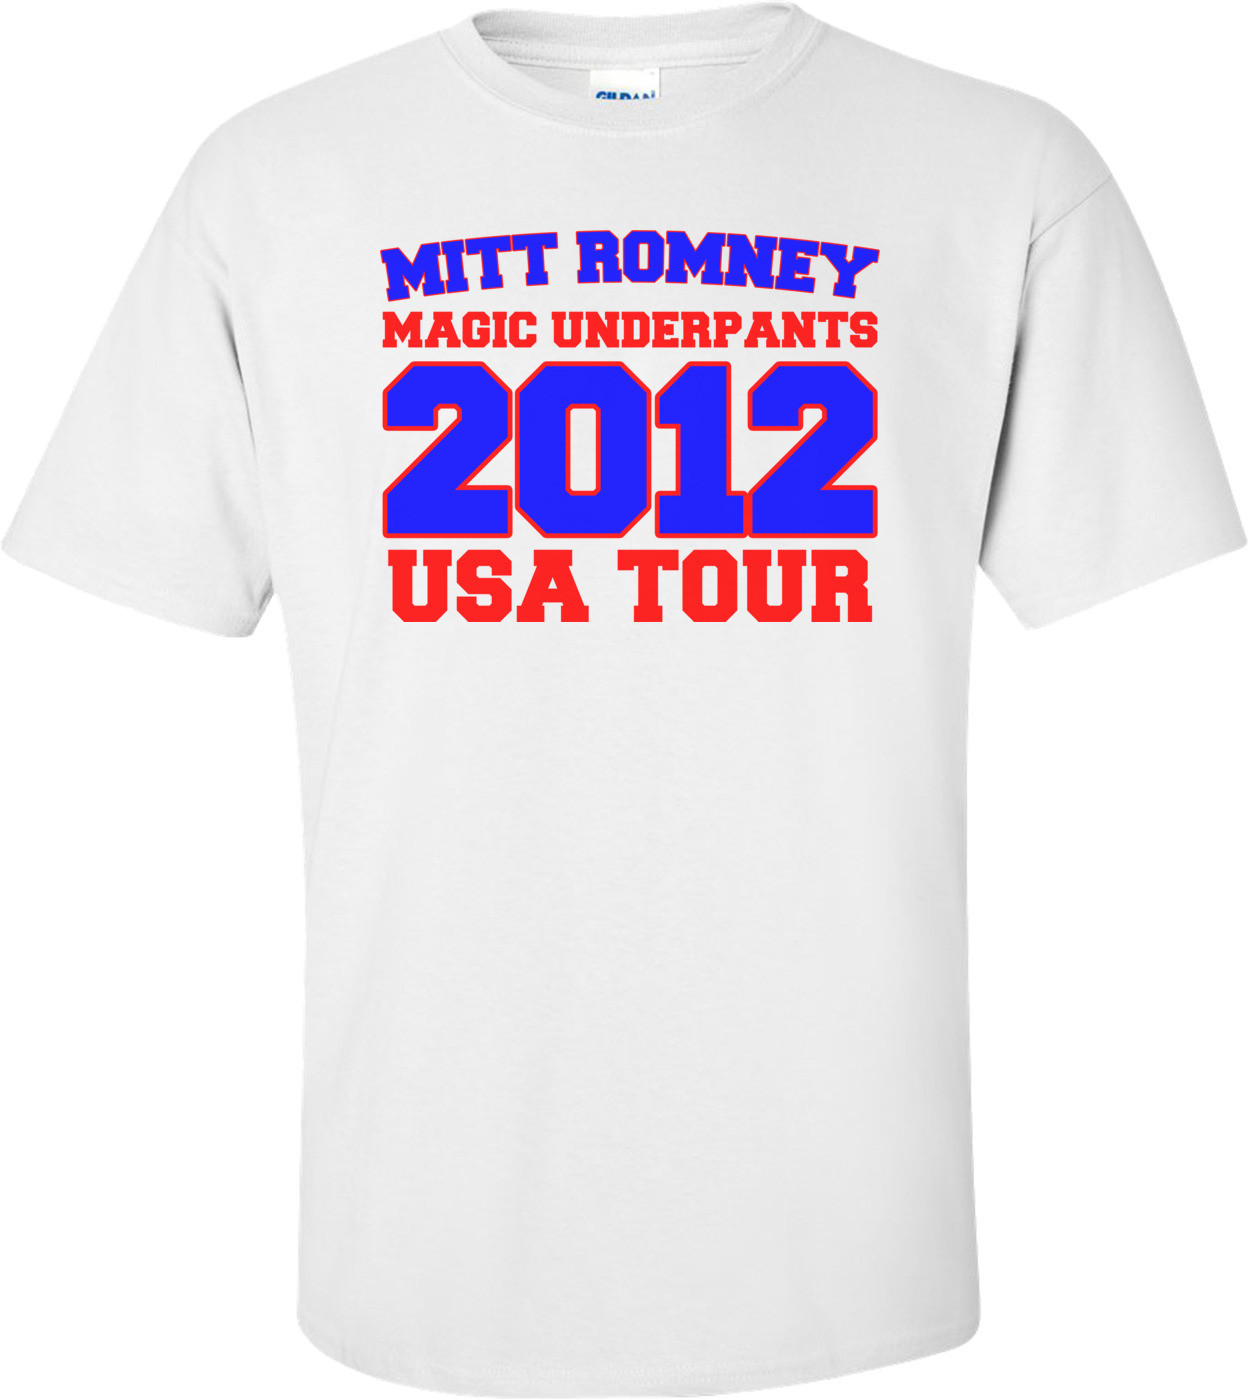 Mitt Romney Magic Underpants 2012 Usa Tour - Anti Mitt Romney Shirt